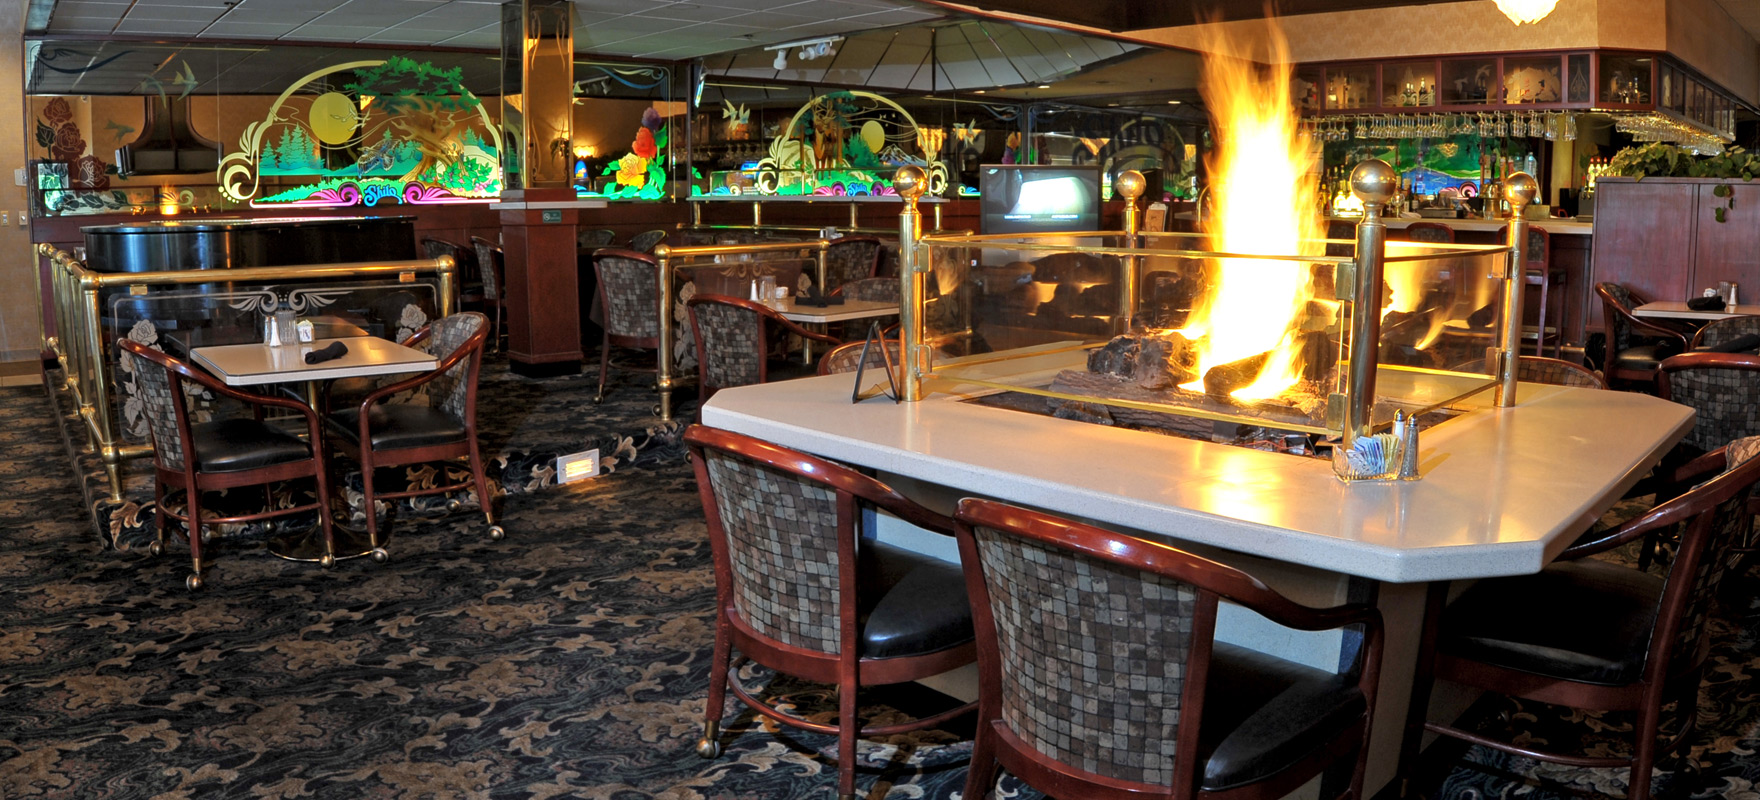 Shilo Inns Suites Hotels Portland Airport Oregon